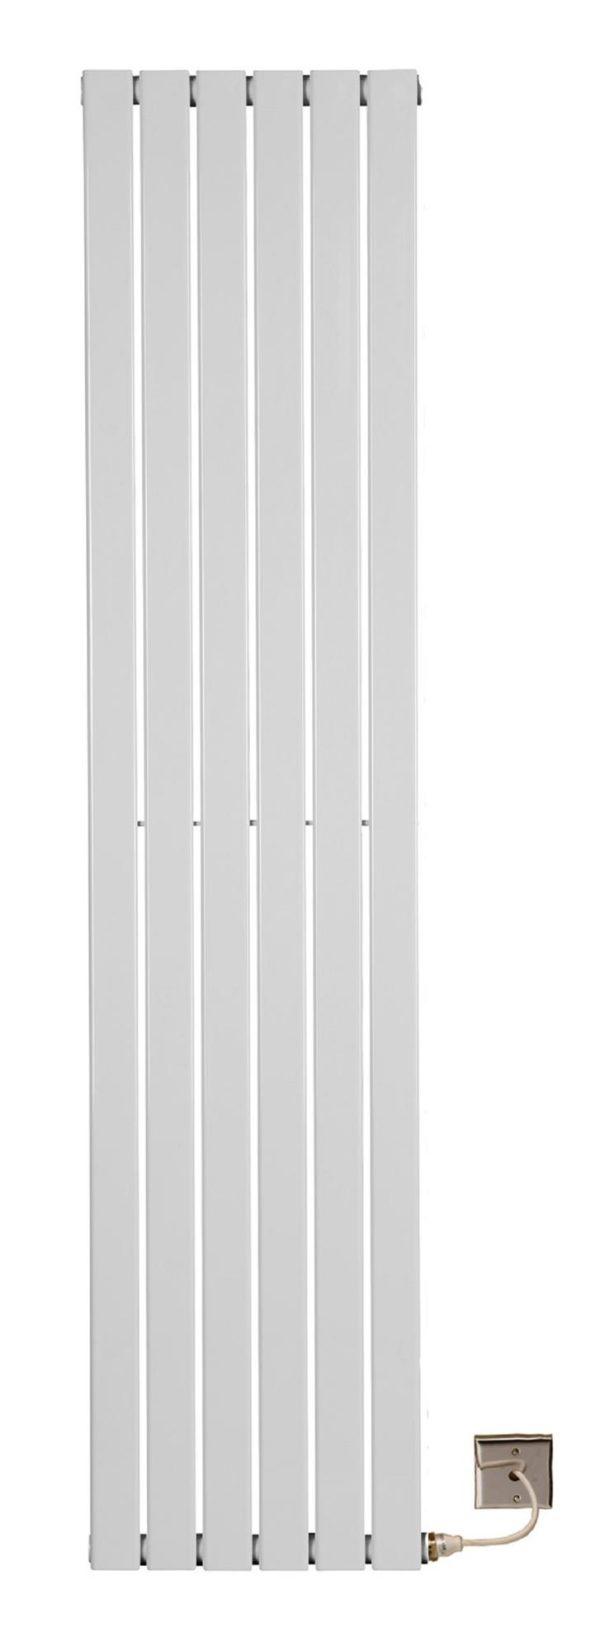 Tamar Electric Vertical Flat Tube Single Panel Radiators 1800mm high